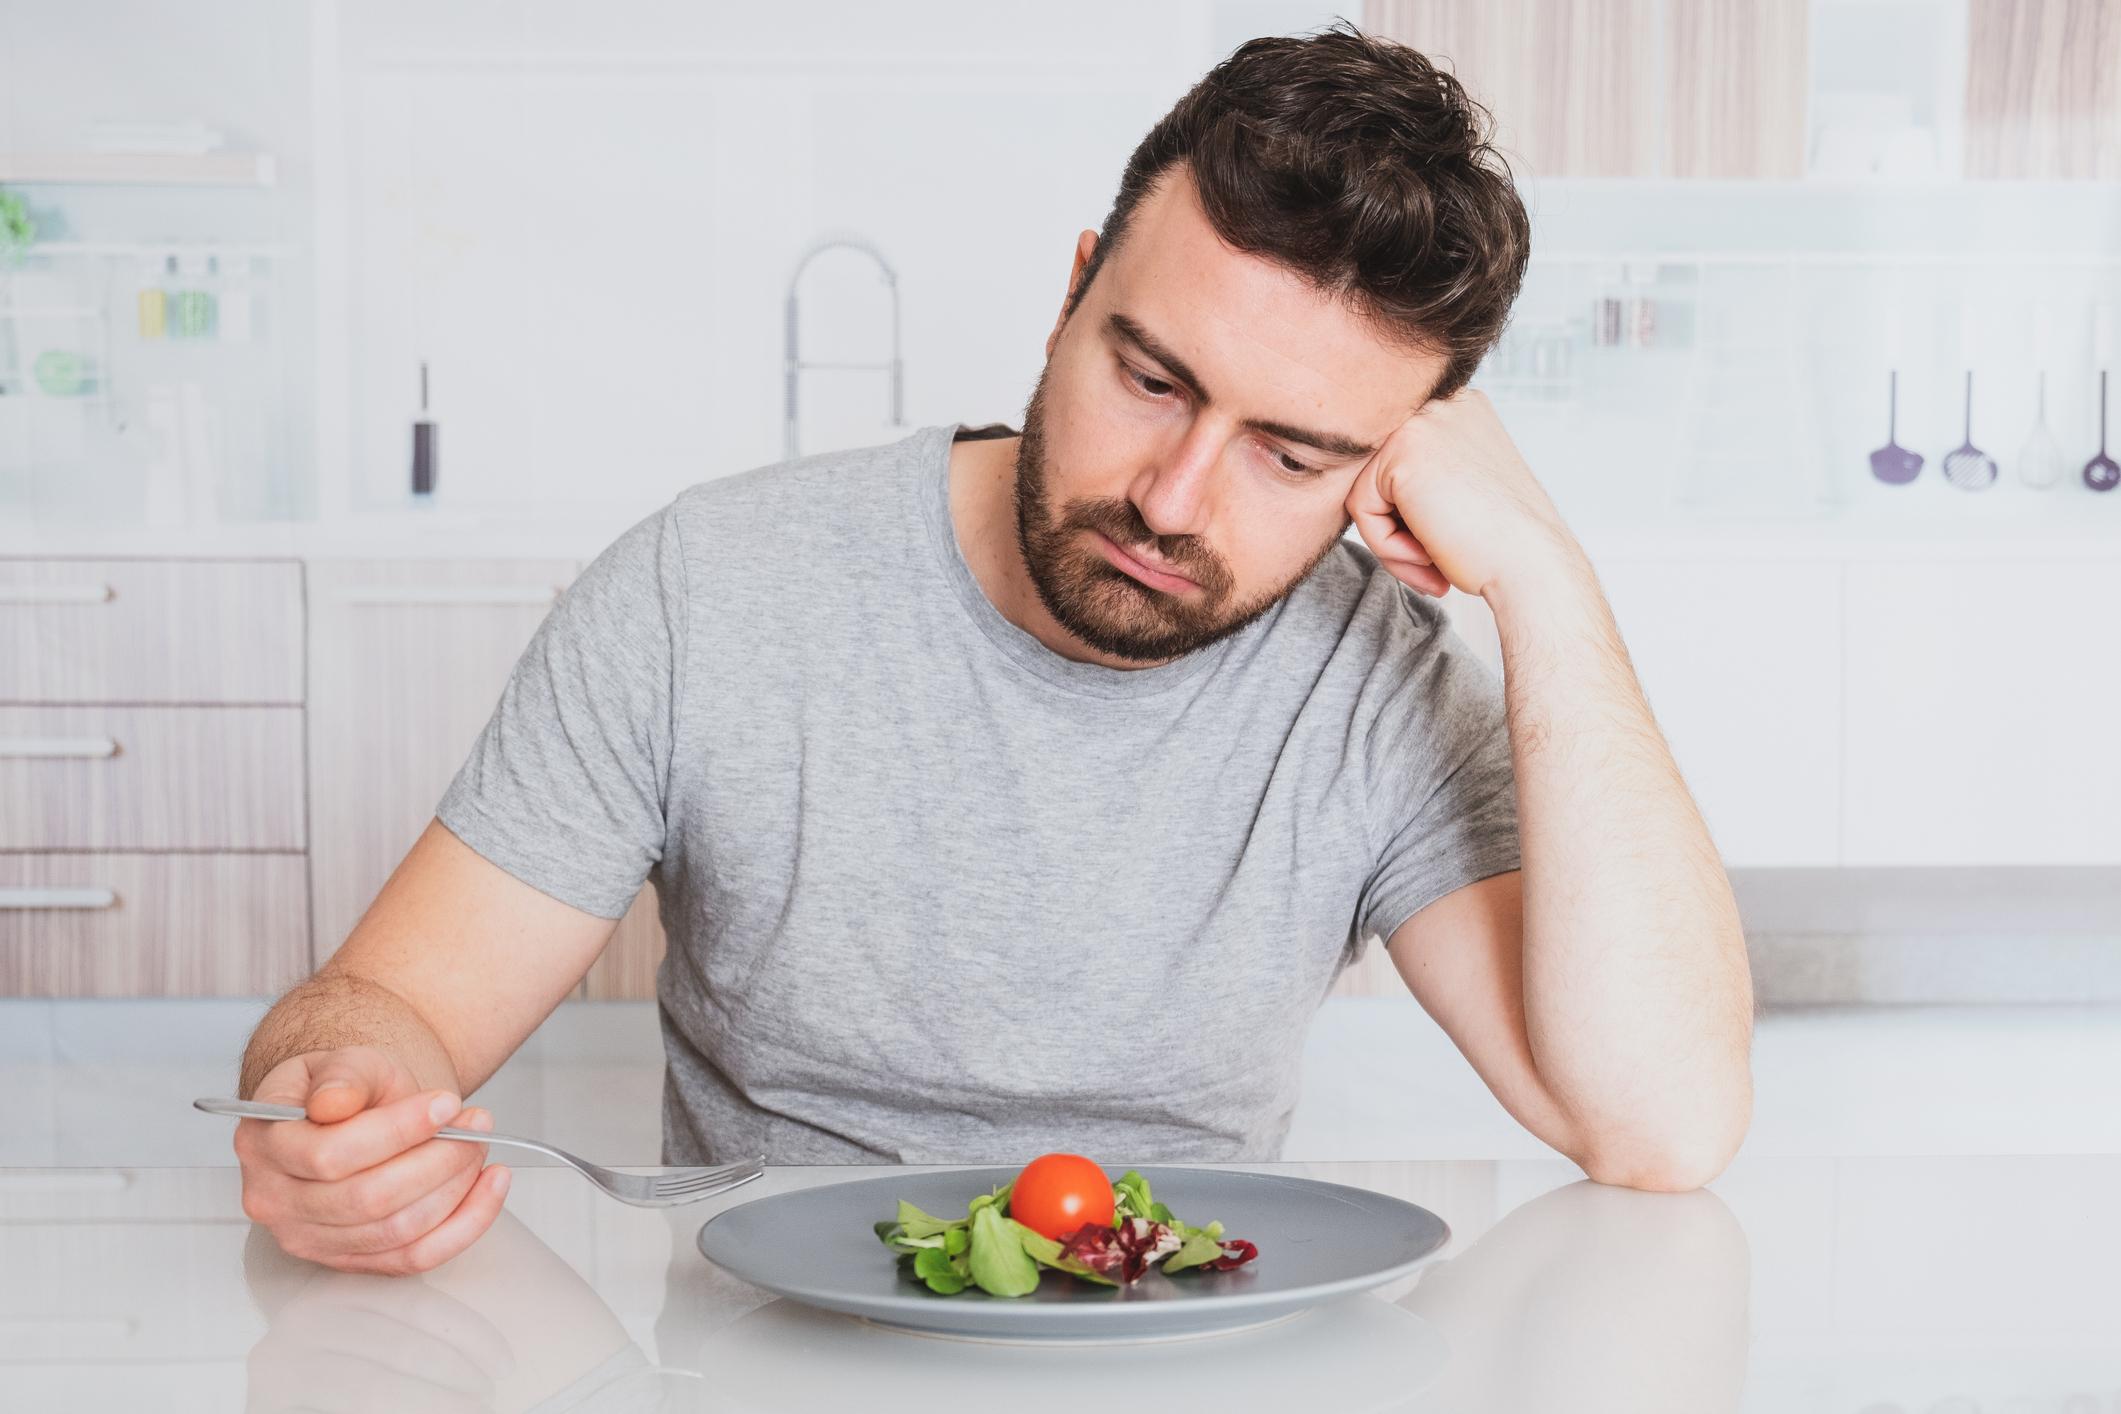 Hombre con un plato de comida